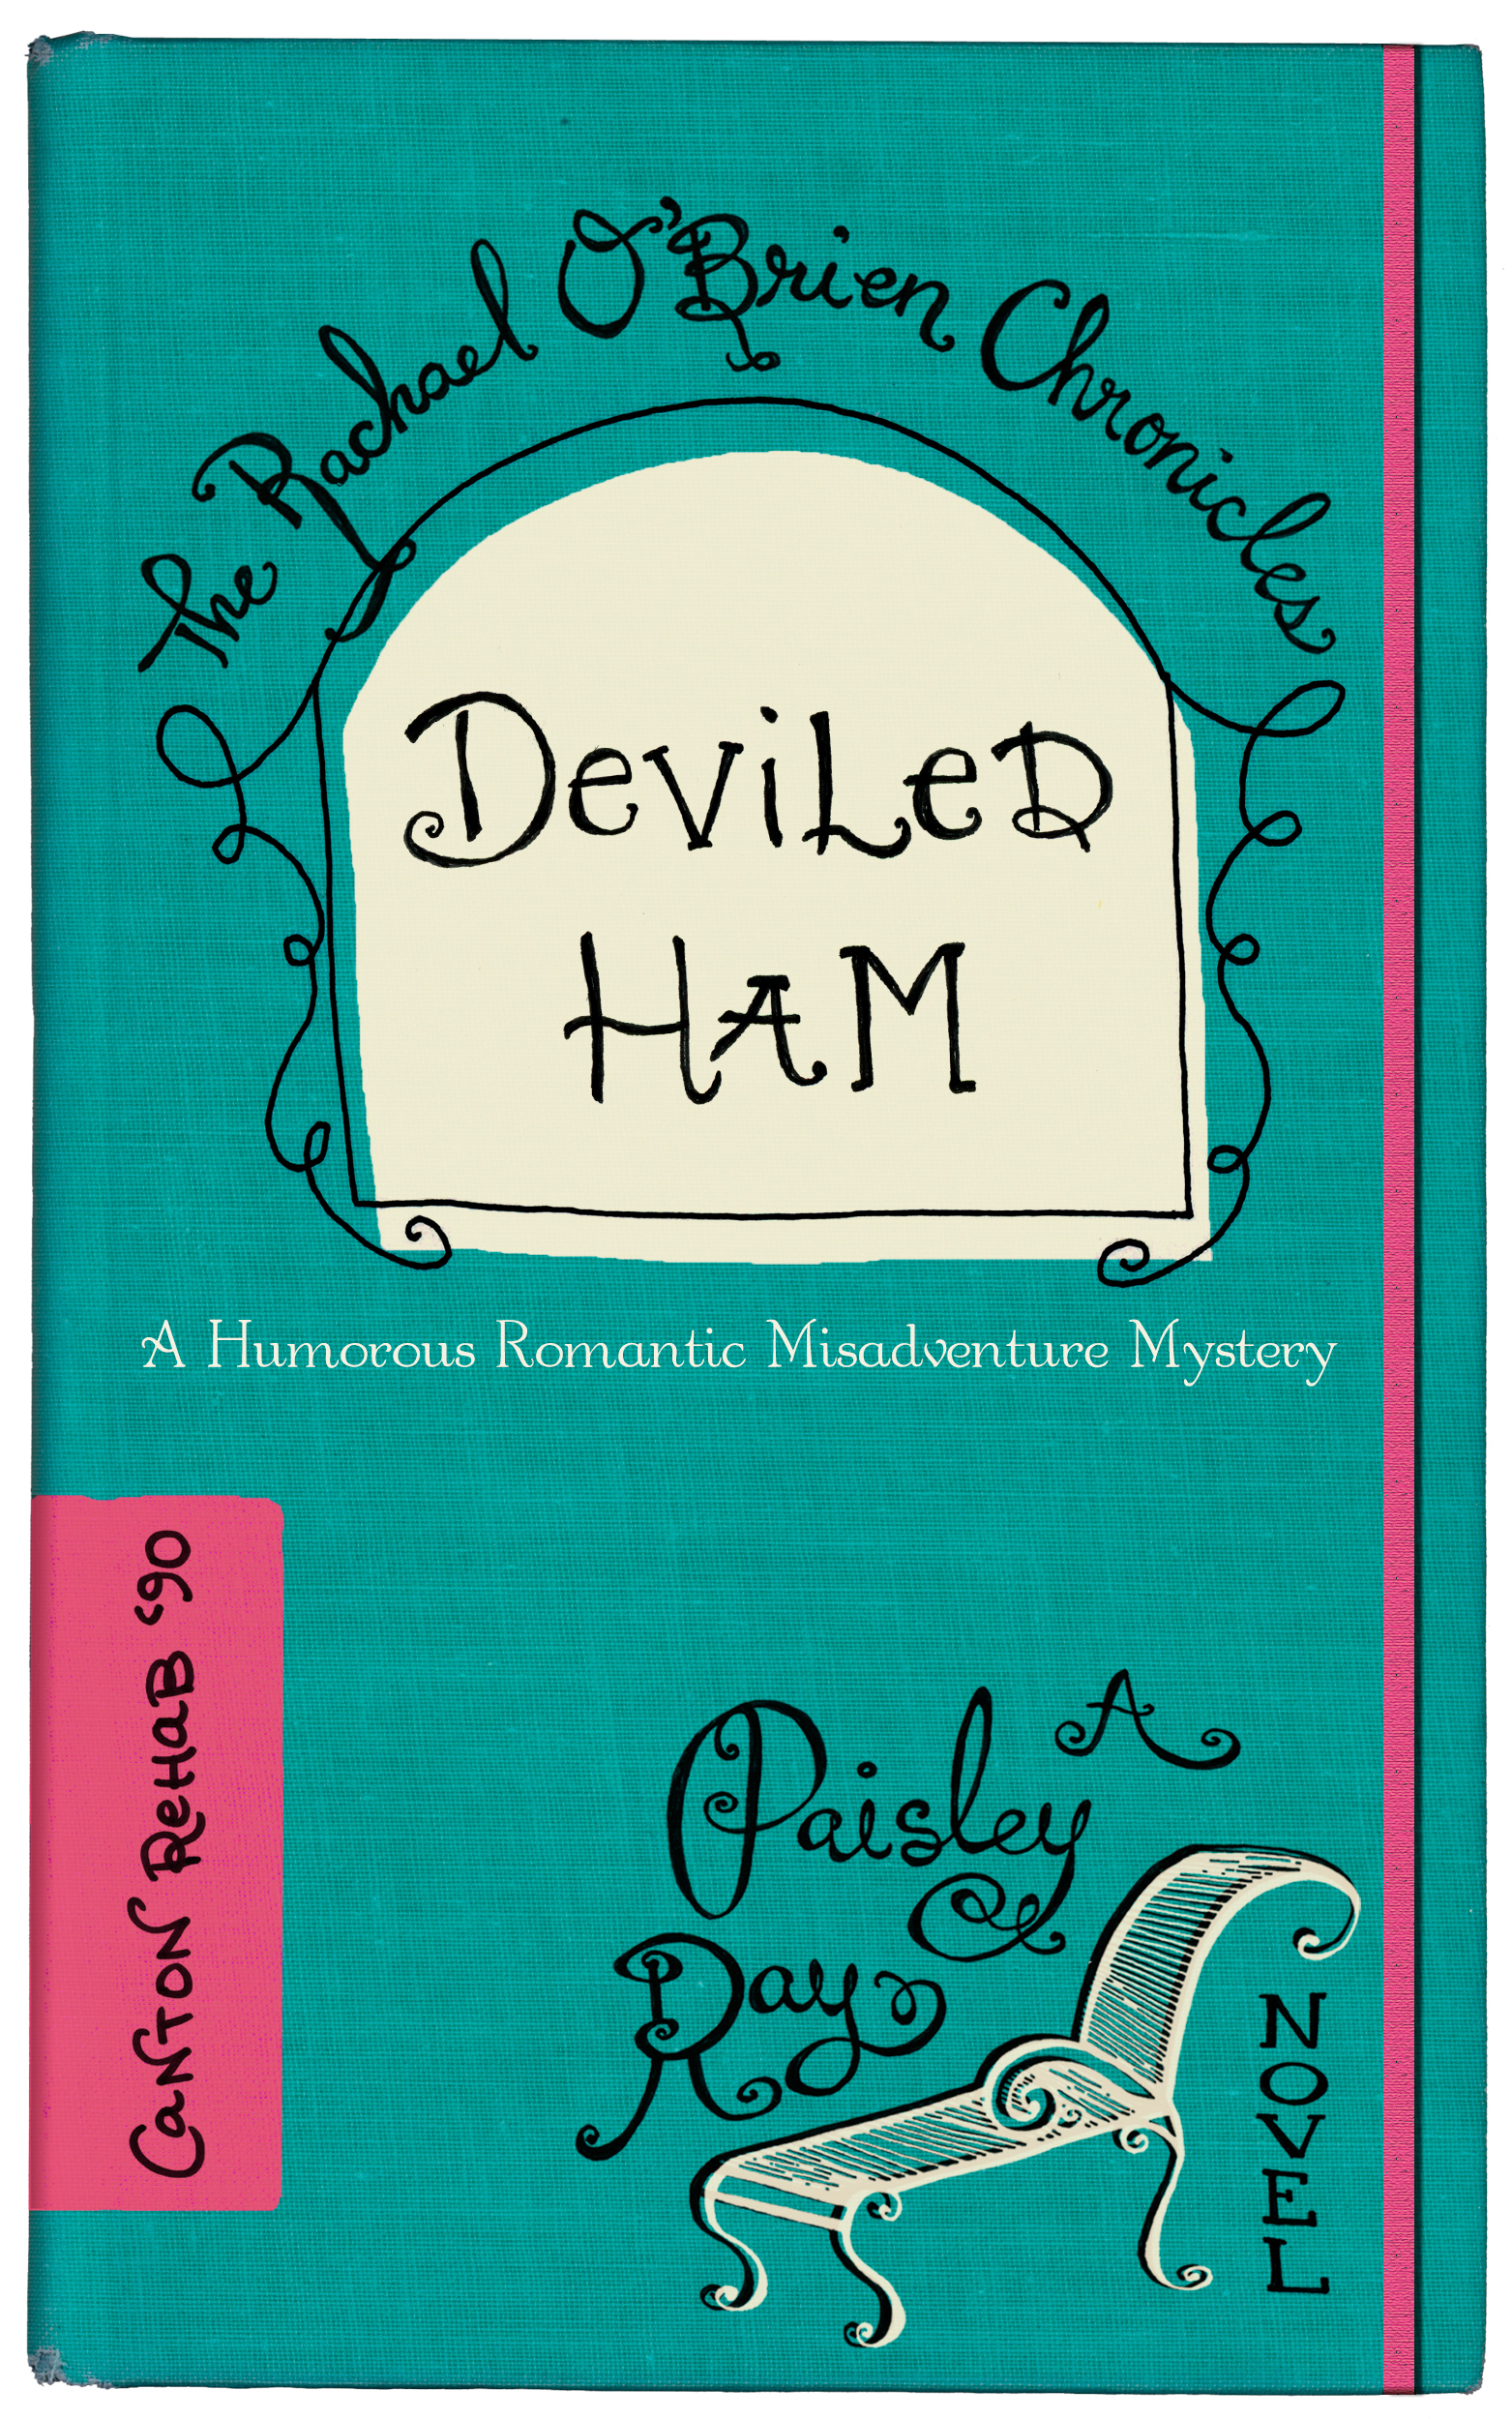 Deviled Ham mystery book